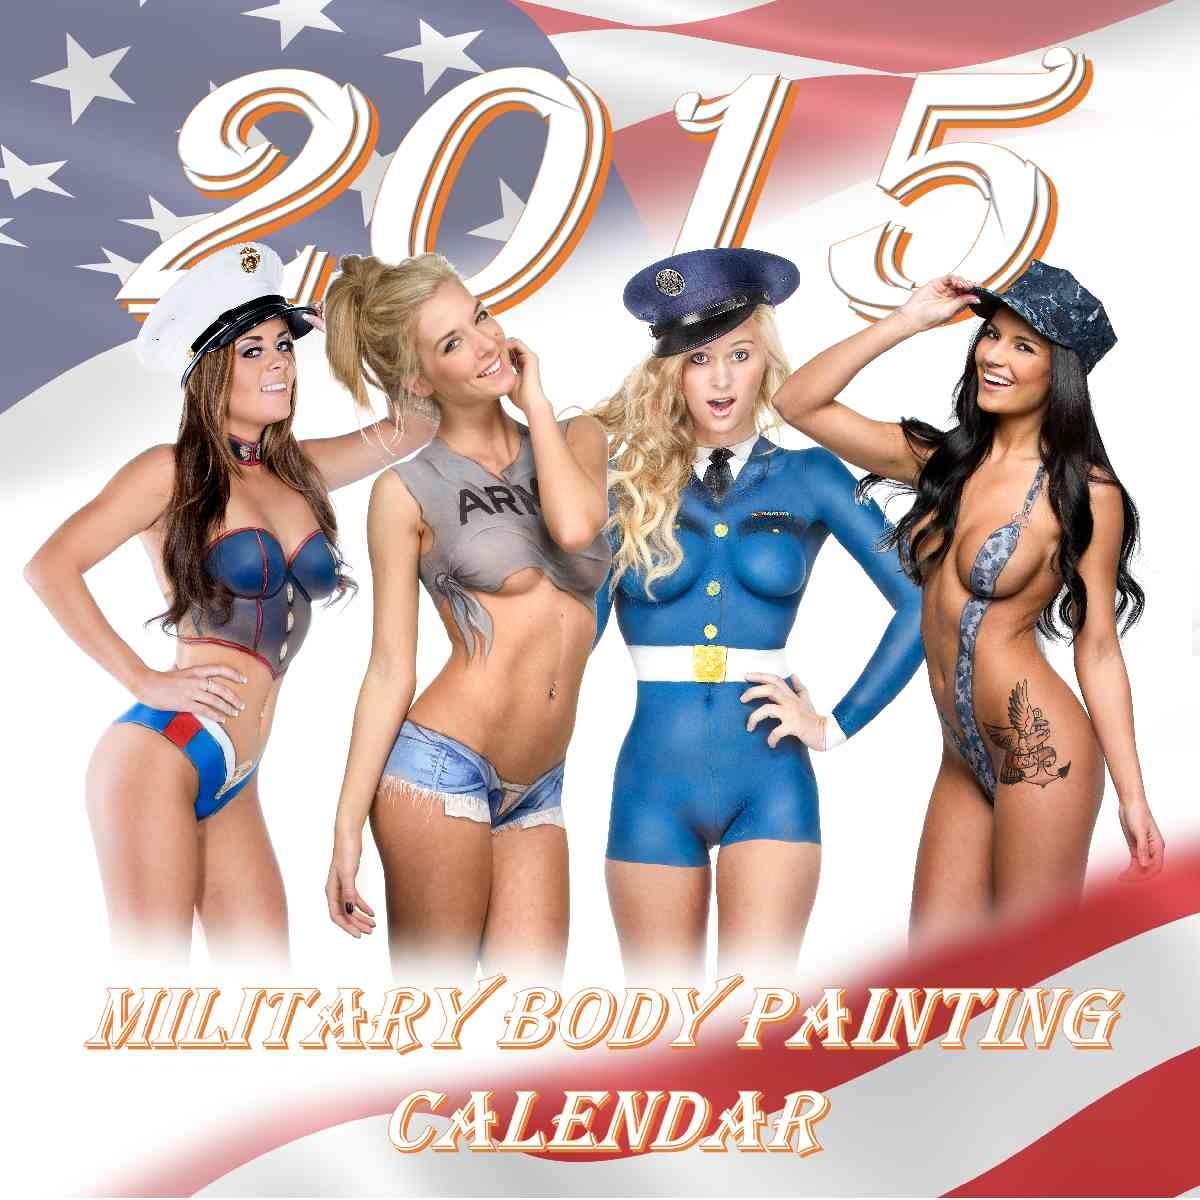 2015 Military Body Painting Calendar Engelart 9780985145736 Amazon Com Books